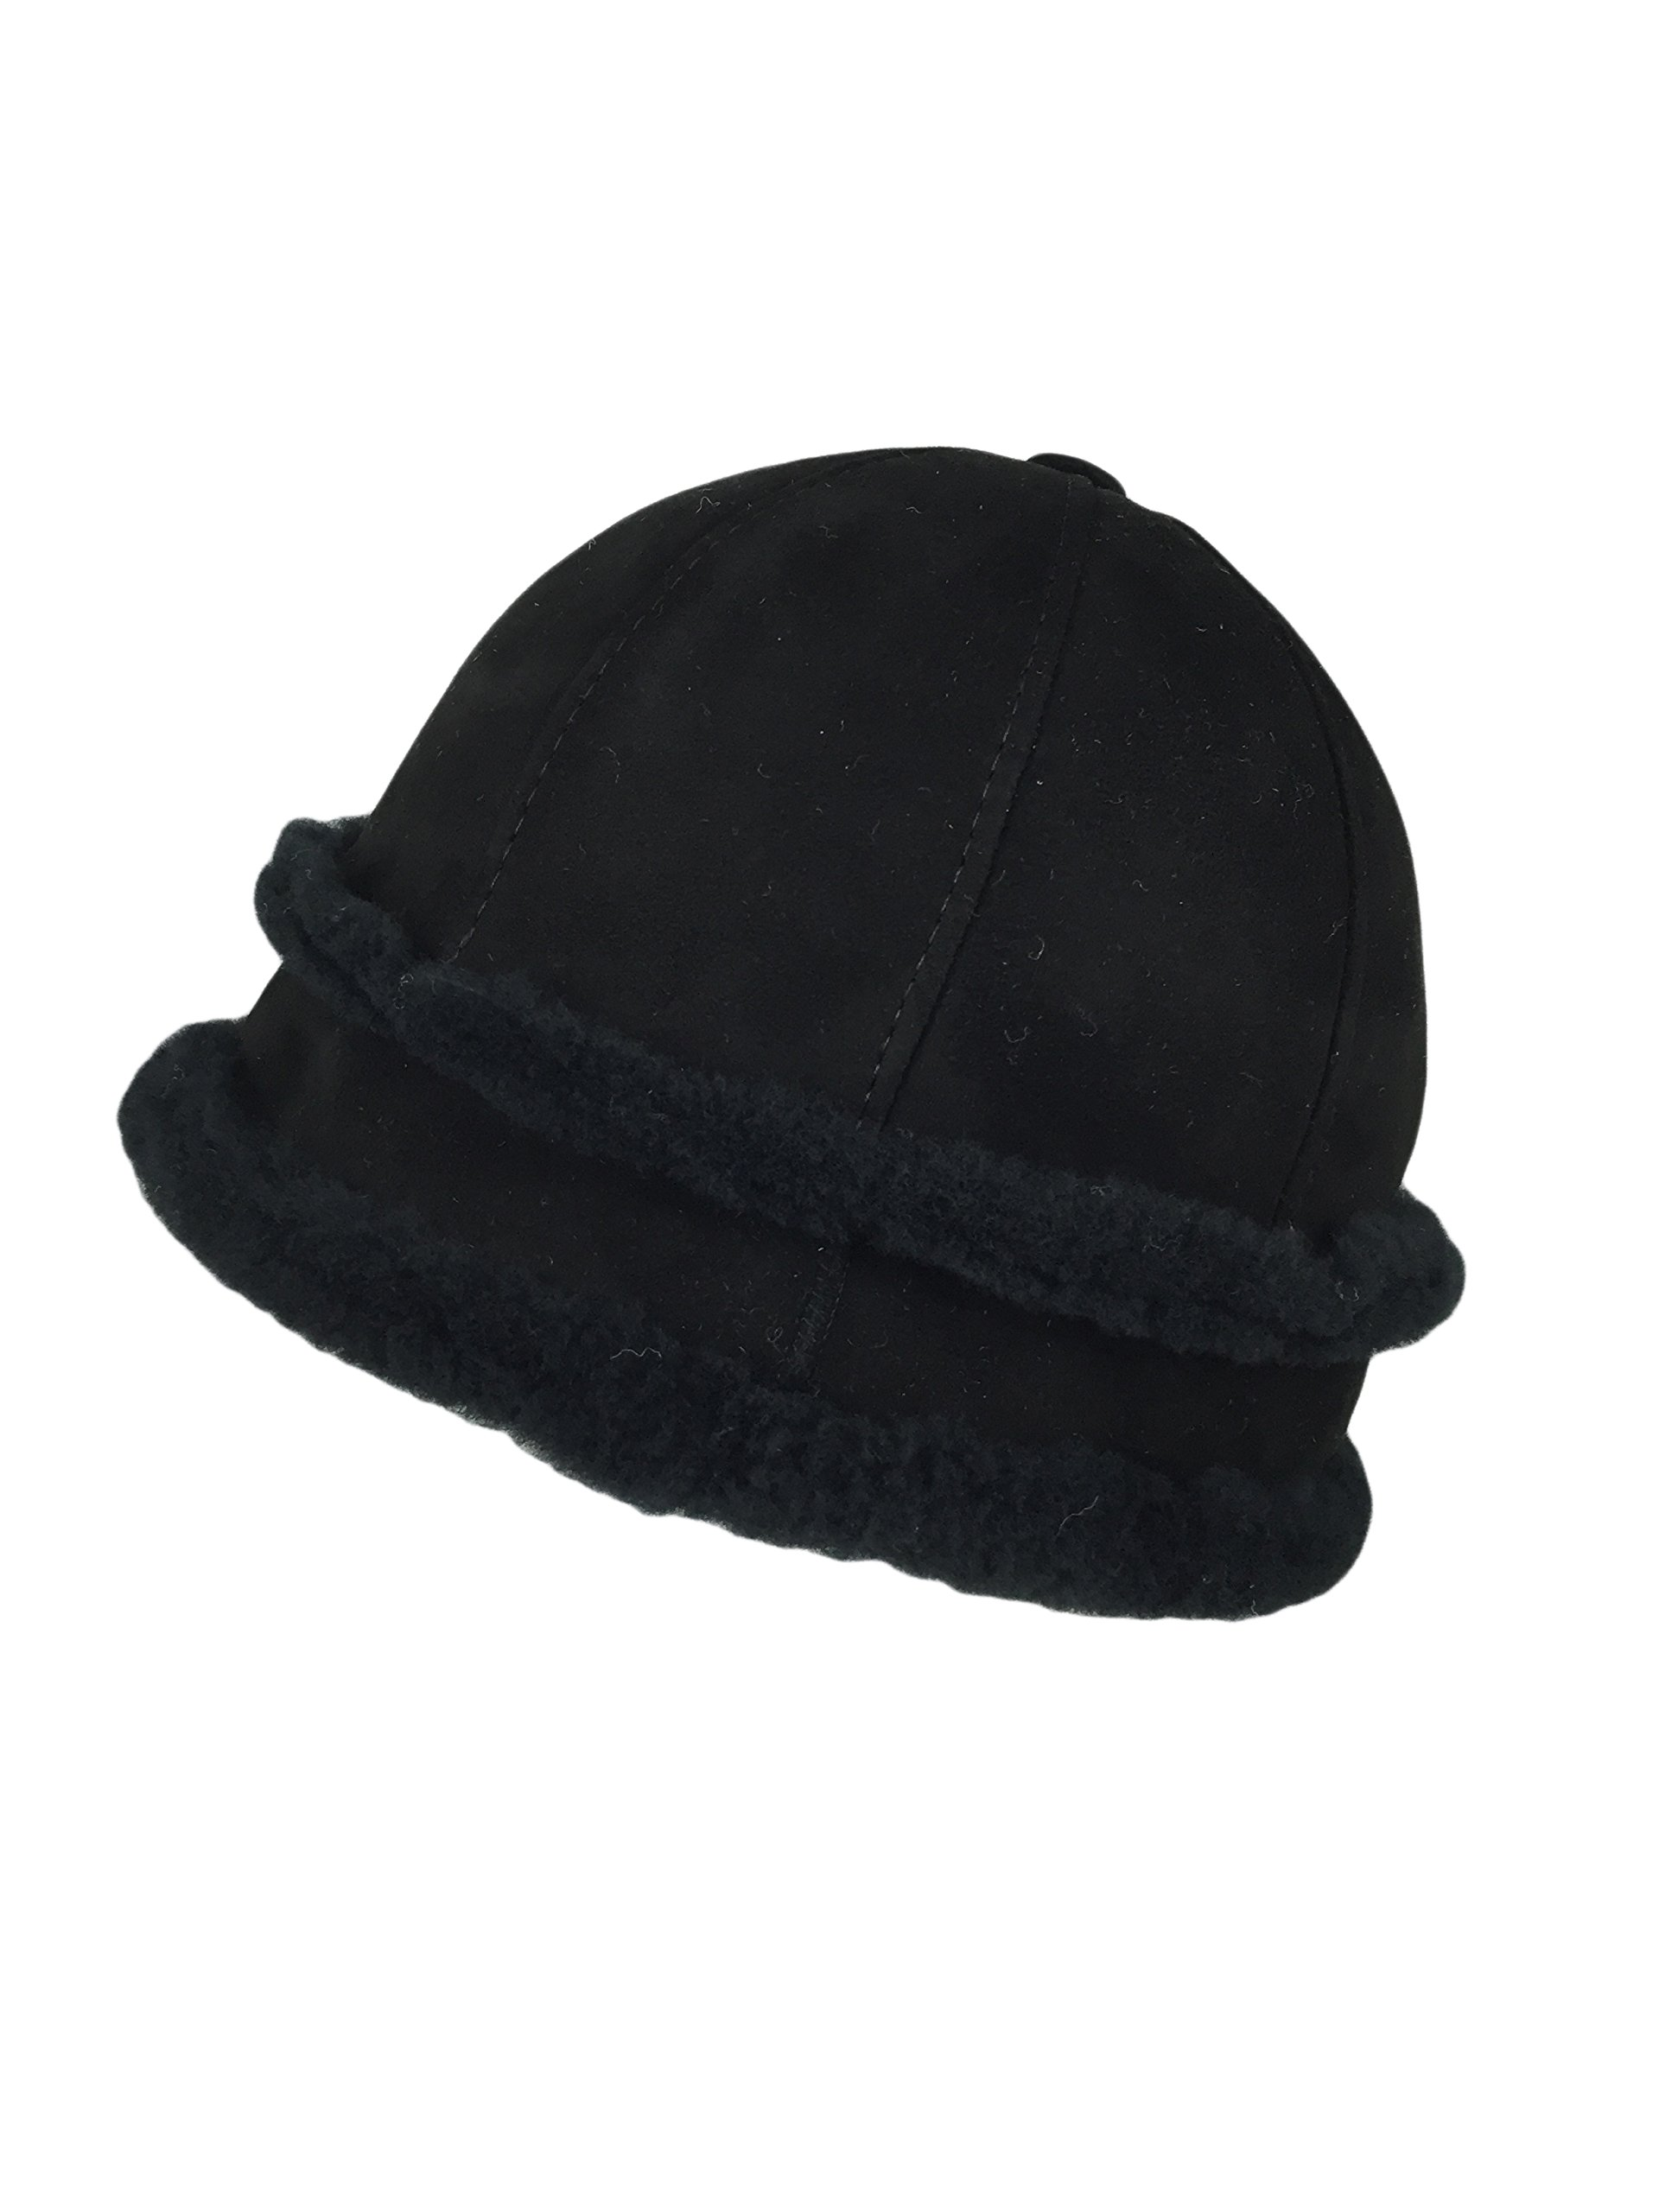 Zavelio Women's Shearling Sheepskin Winter Fur Bucket Beanie Hat Black Suede M